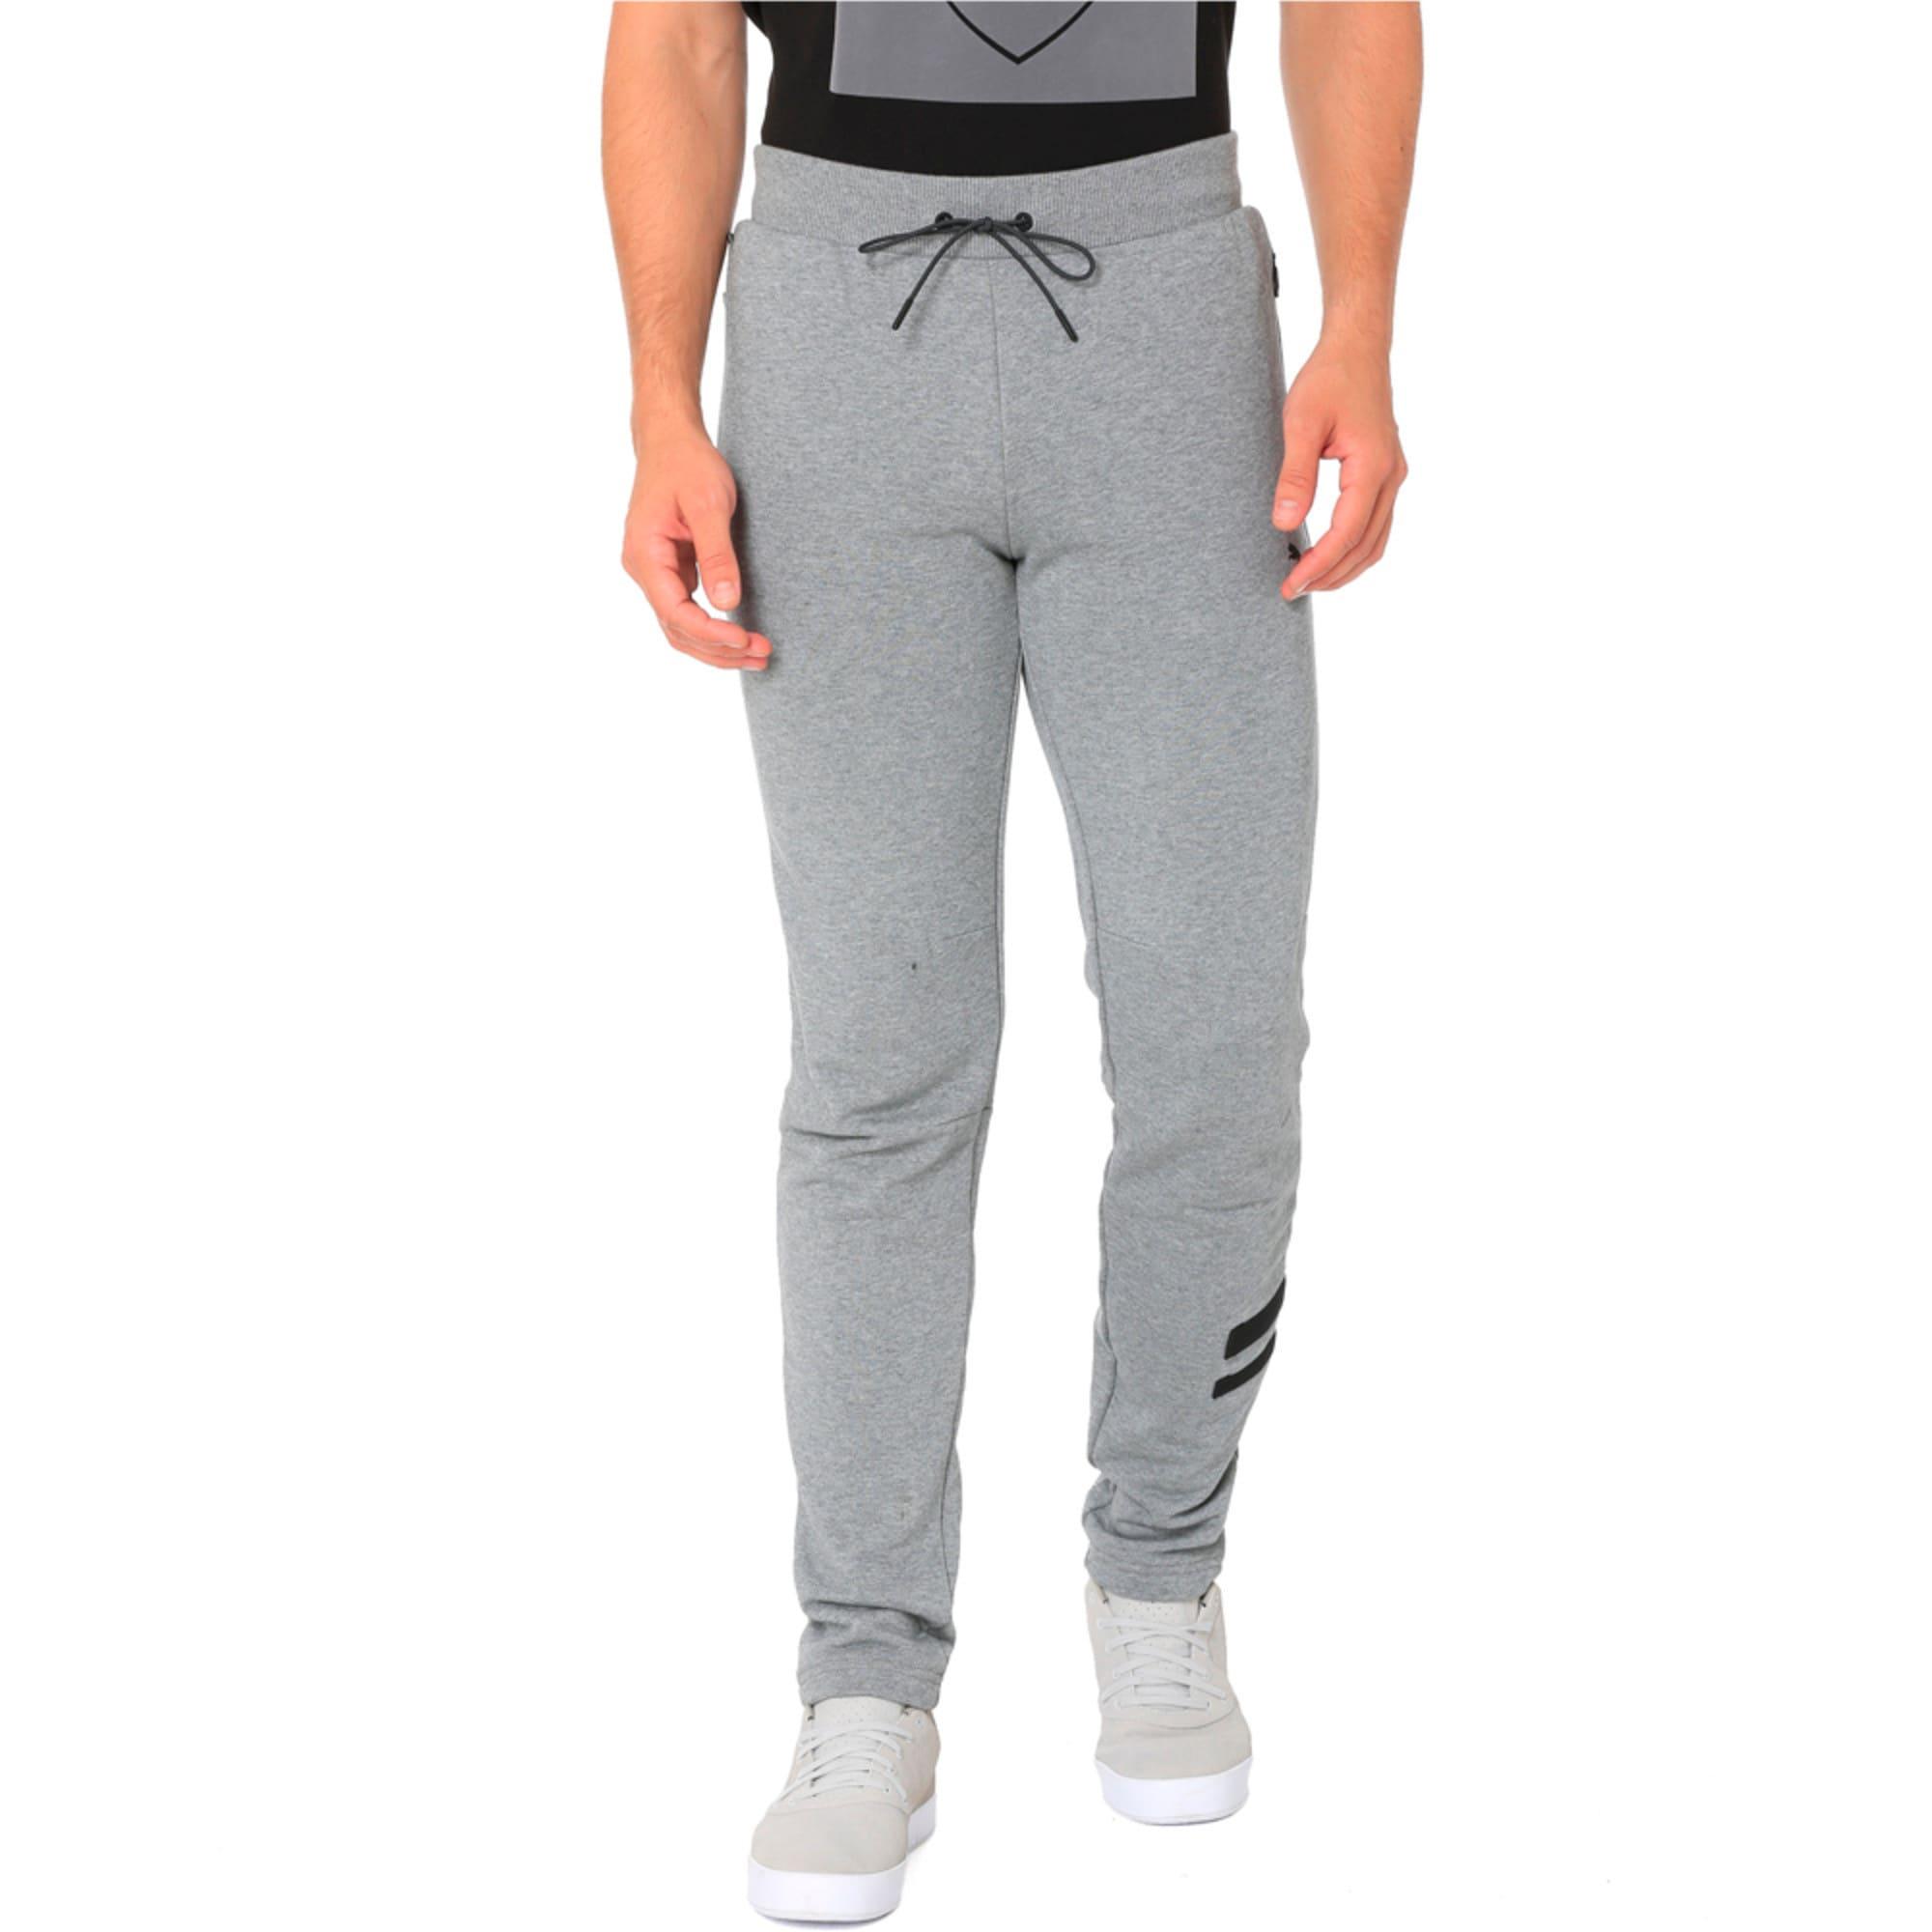 Thumbnail 1 of Ferrari Lifestyle Men's Sweatpants, Medium Gray Heather, medium-IND